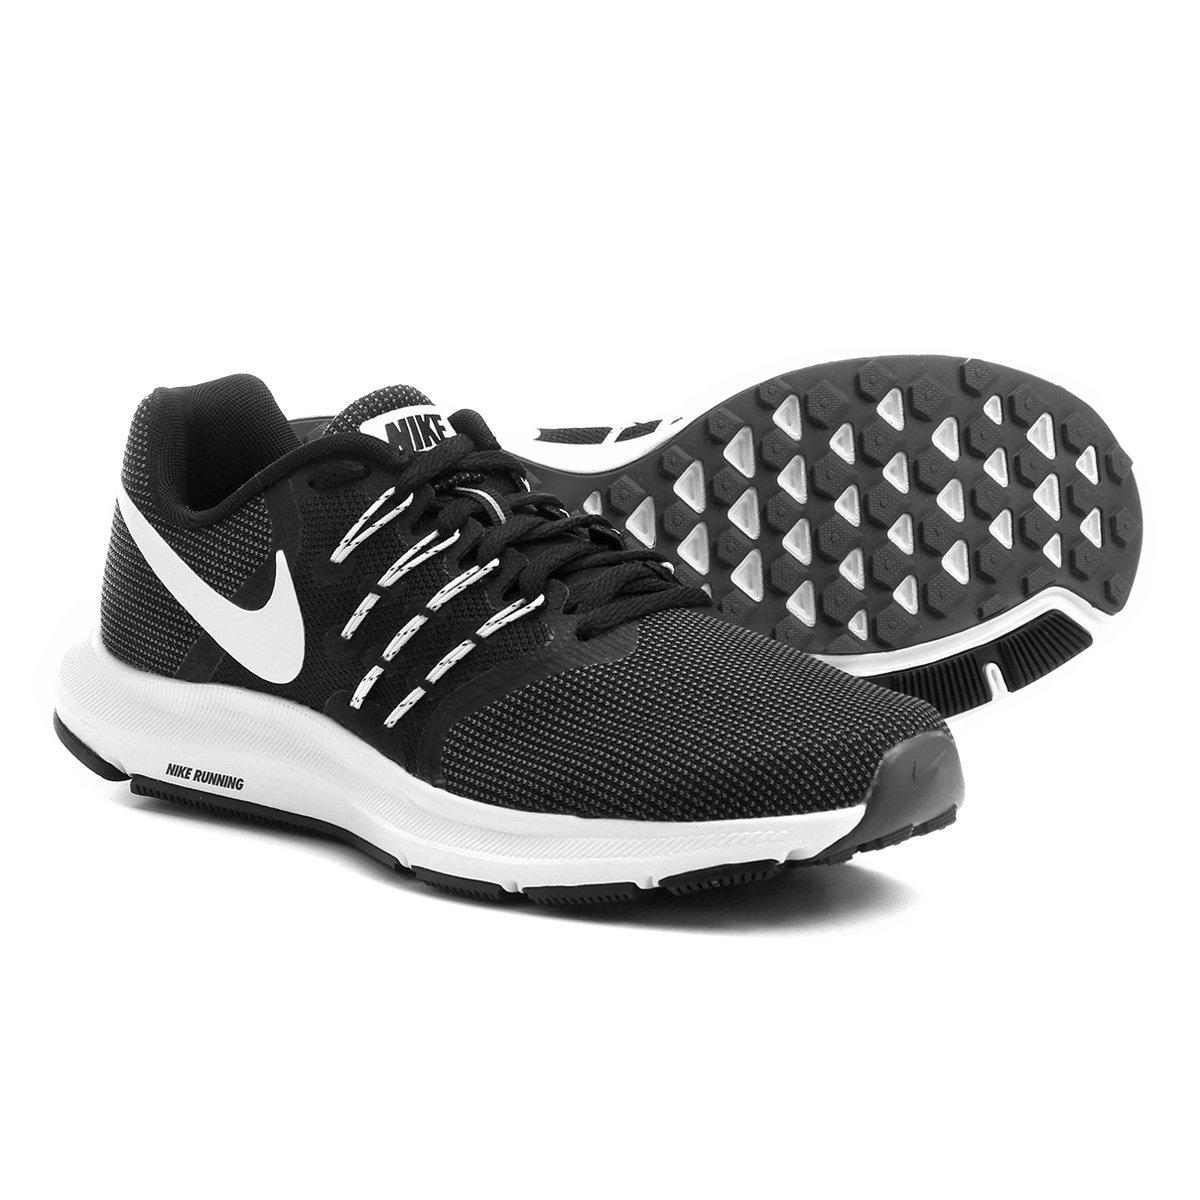 8a54623964 Tênis Nike Run Swift Feminino - Compre Agora